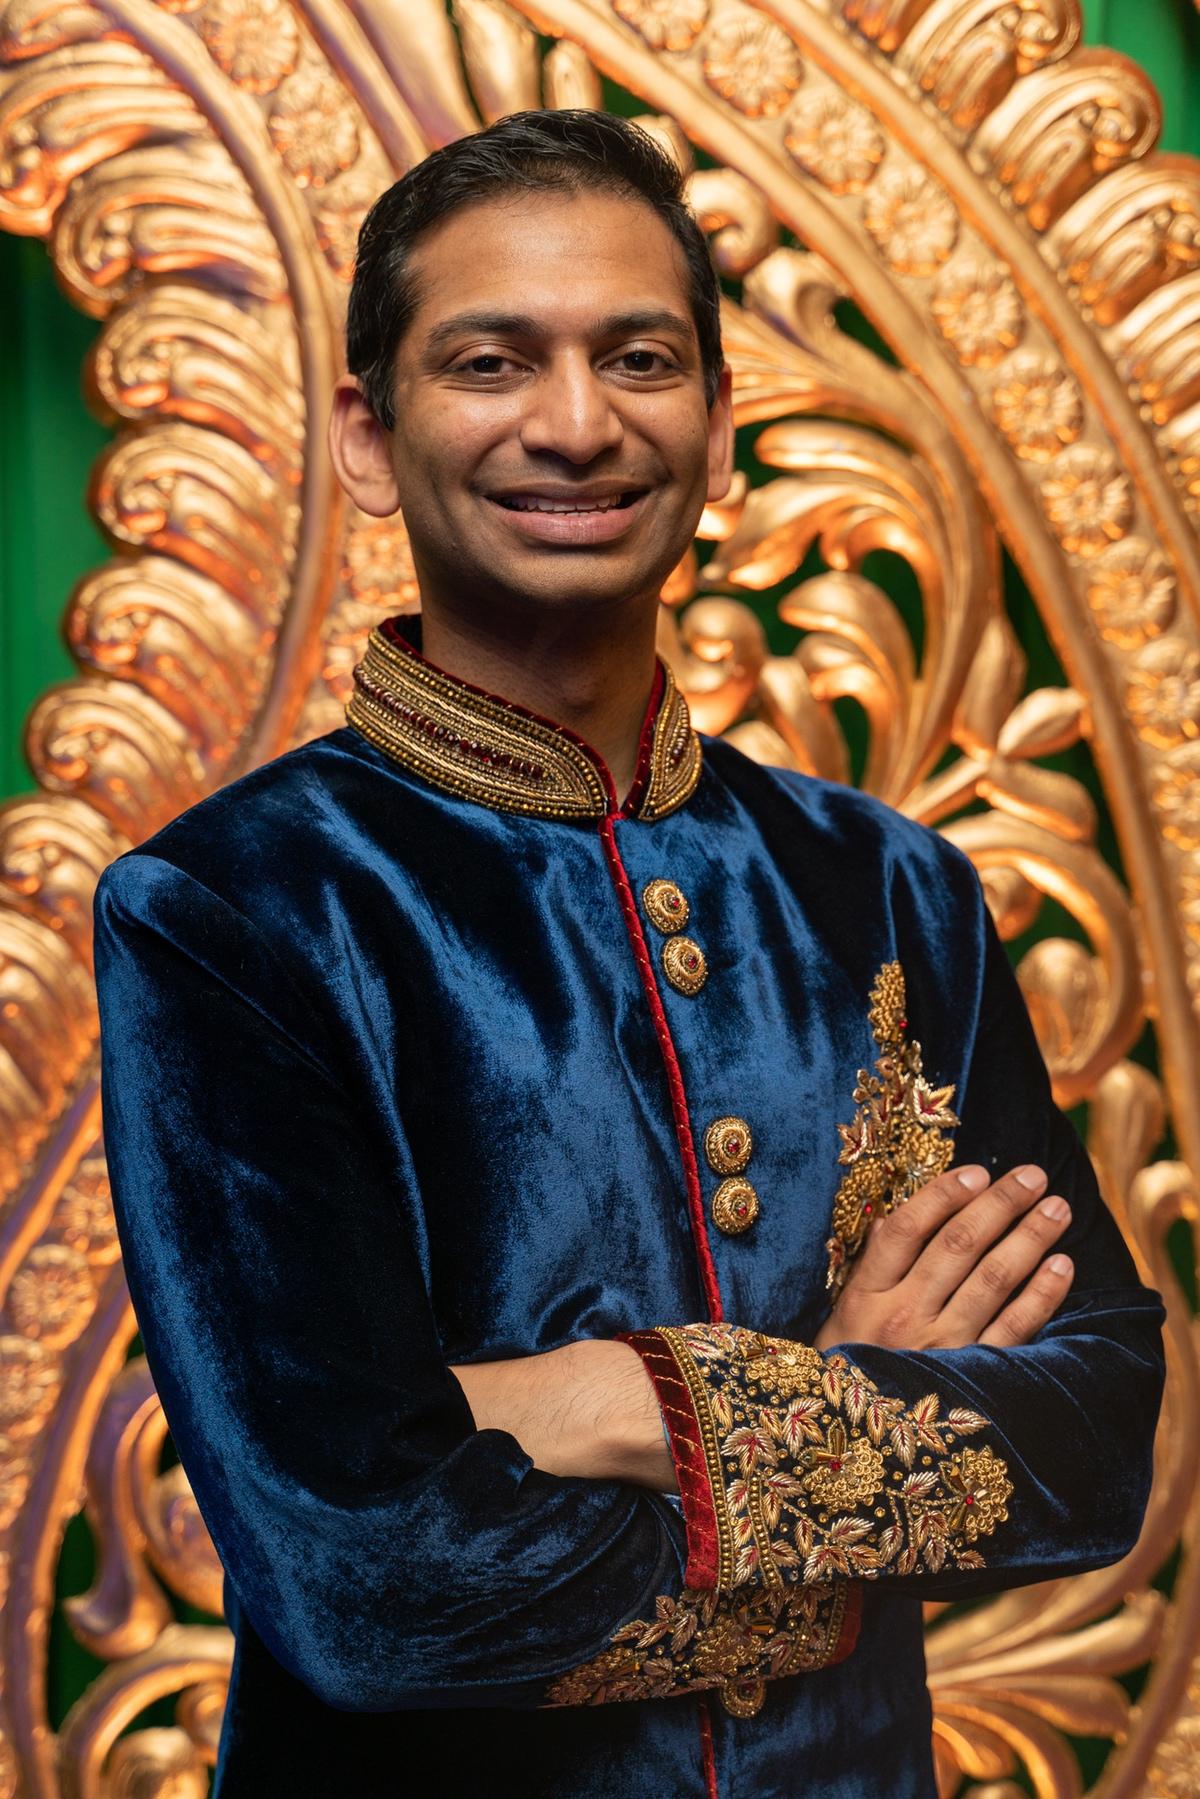 Le Cape Weddings - South Asian Wedding - Chicago Wedding Photographer P&V-11.jpg